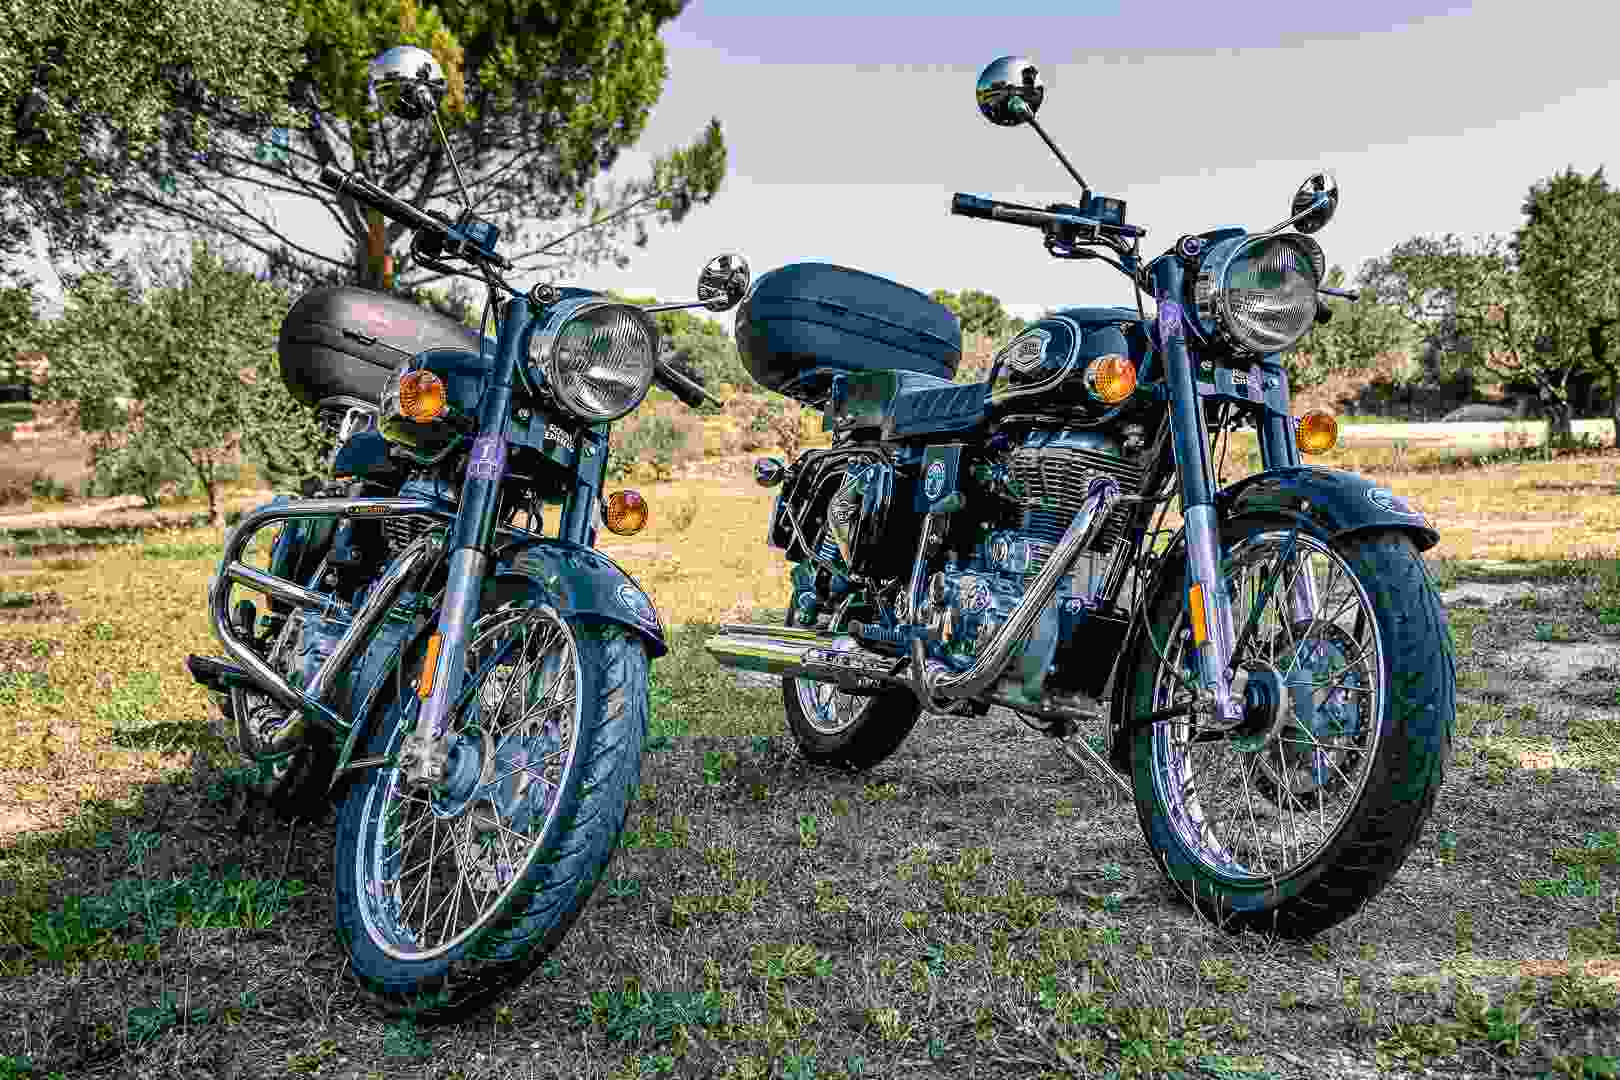 gallerie photo moto alp bm